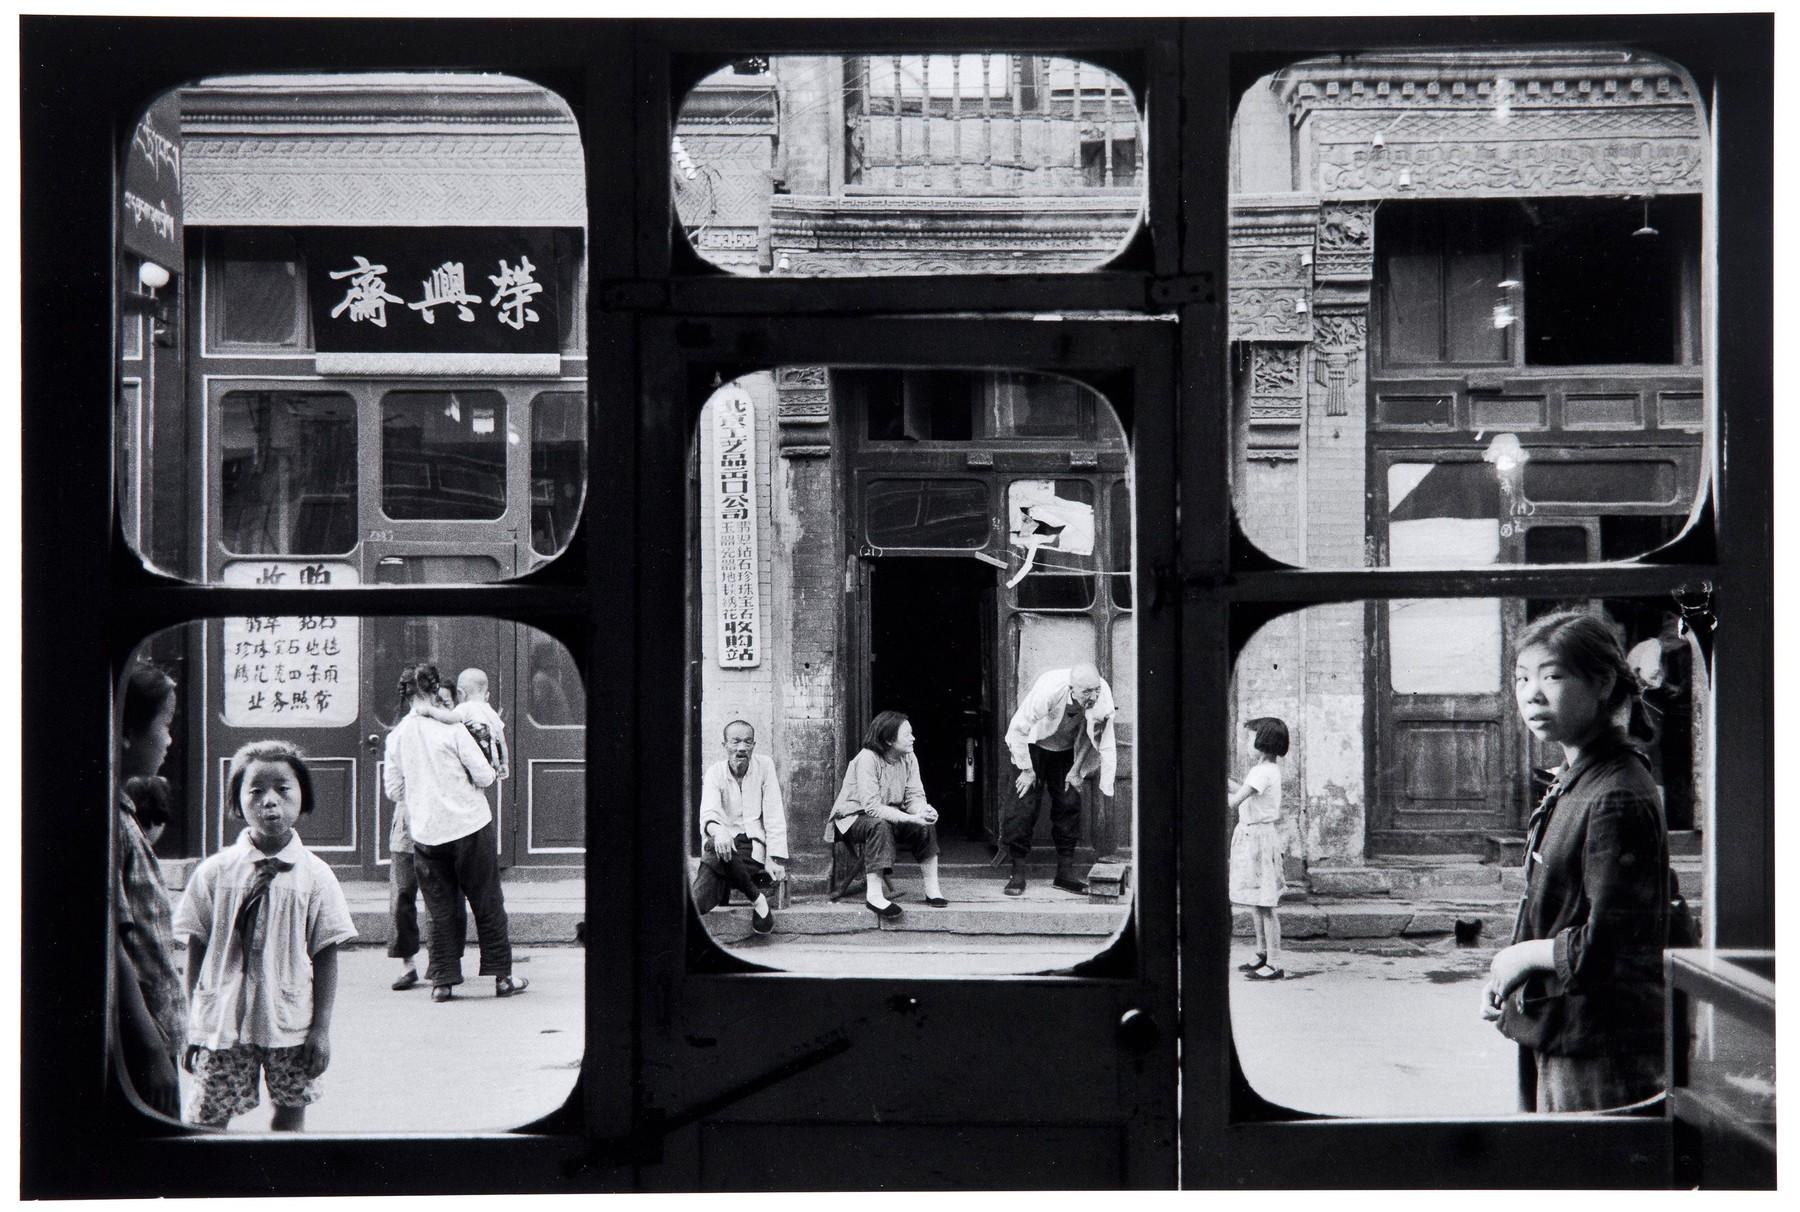 Marc Riboud, Bejing, 1965